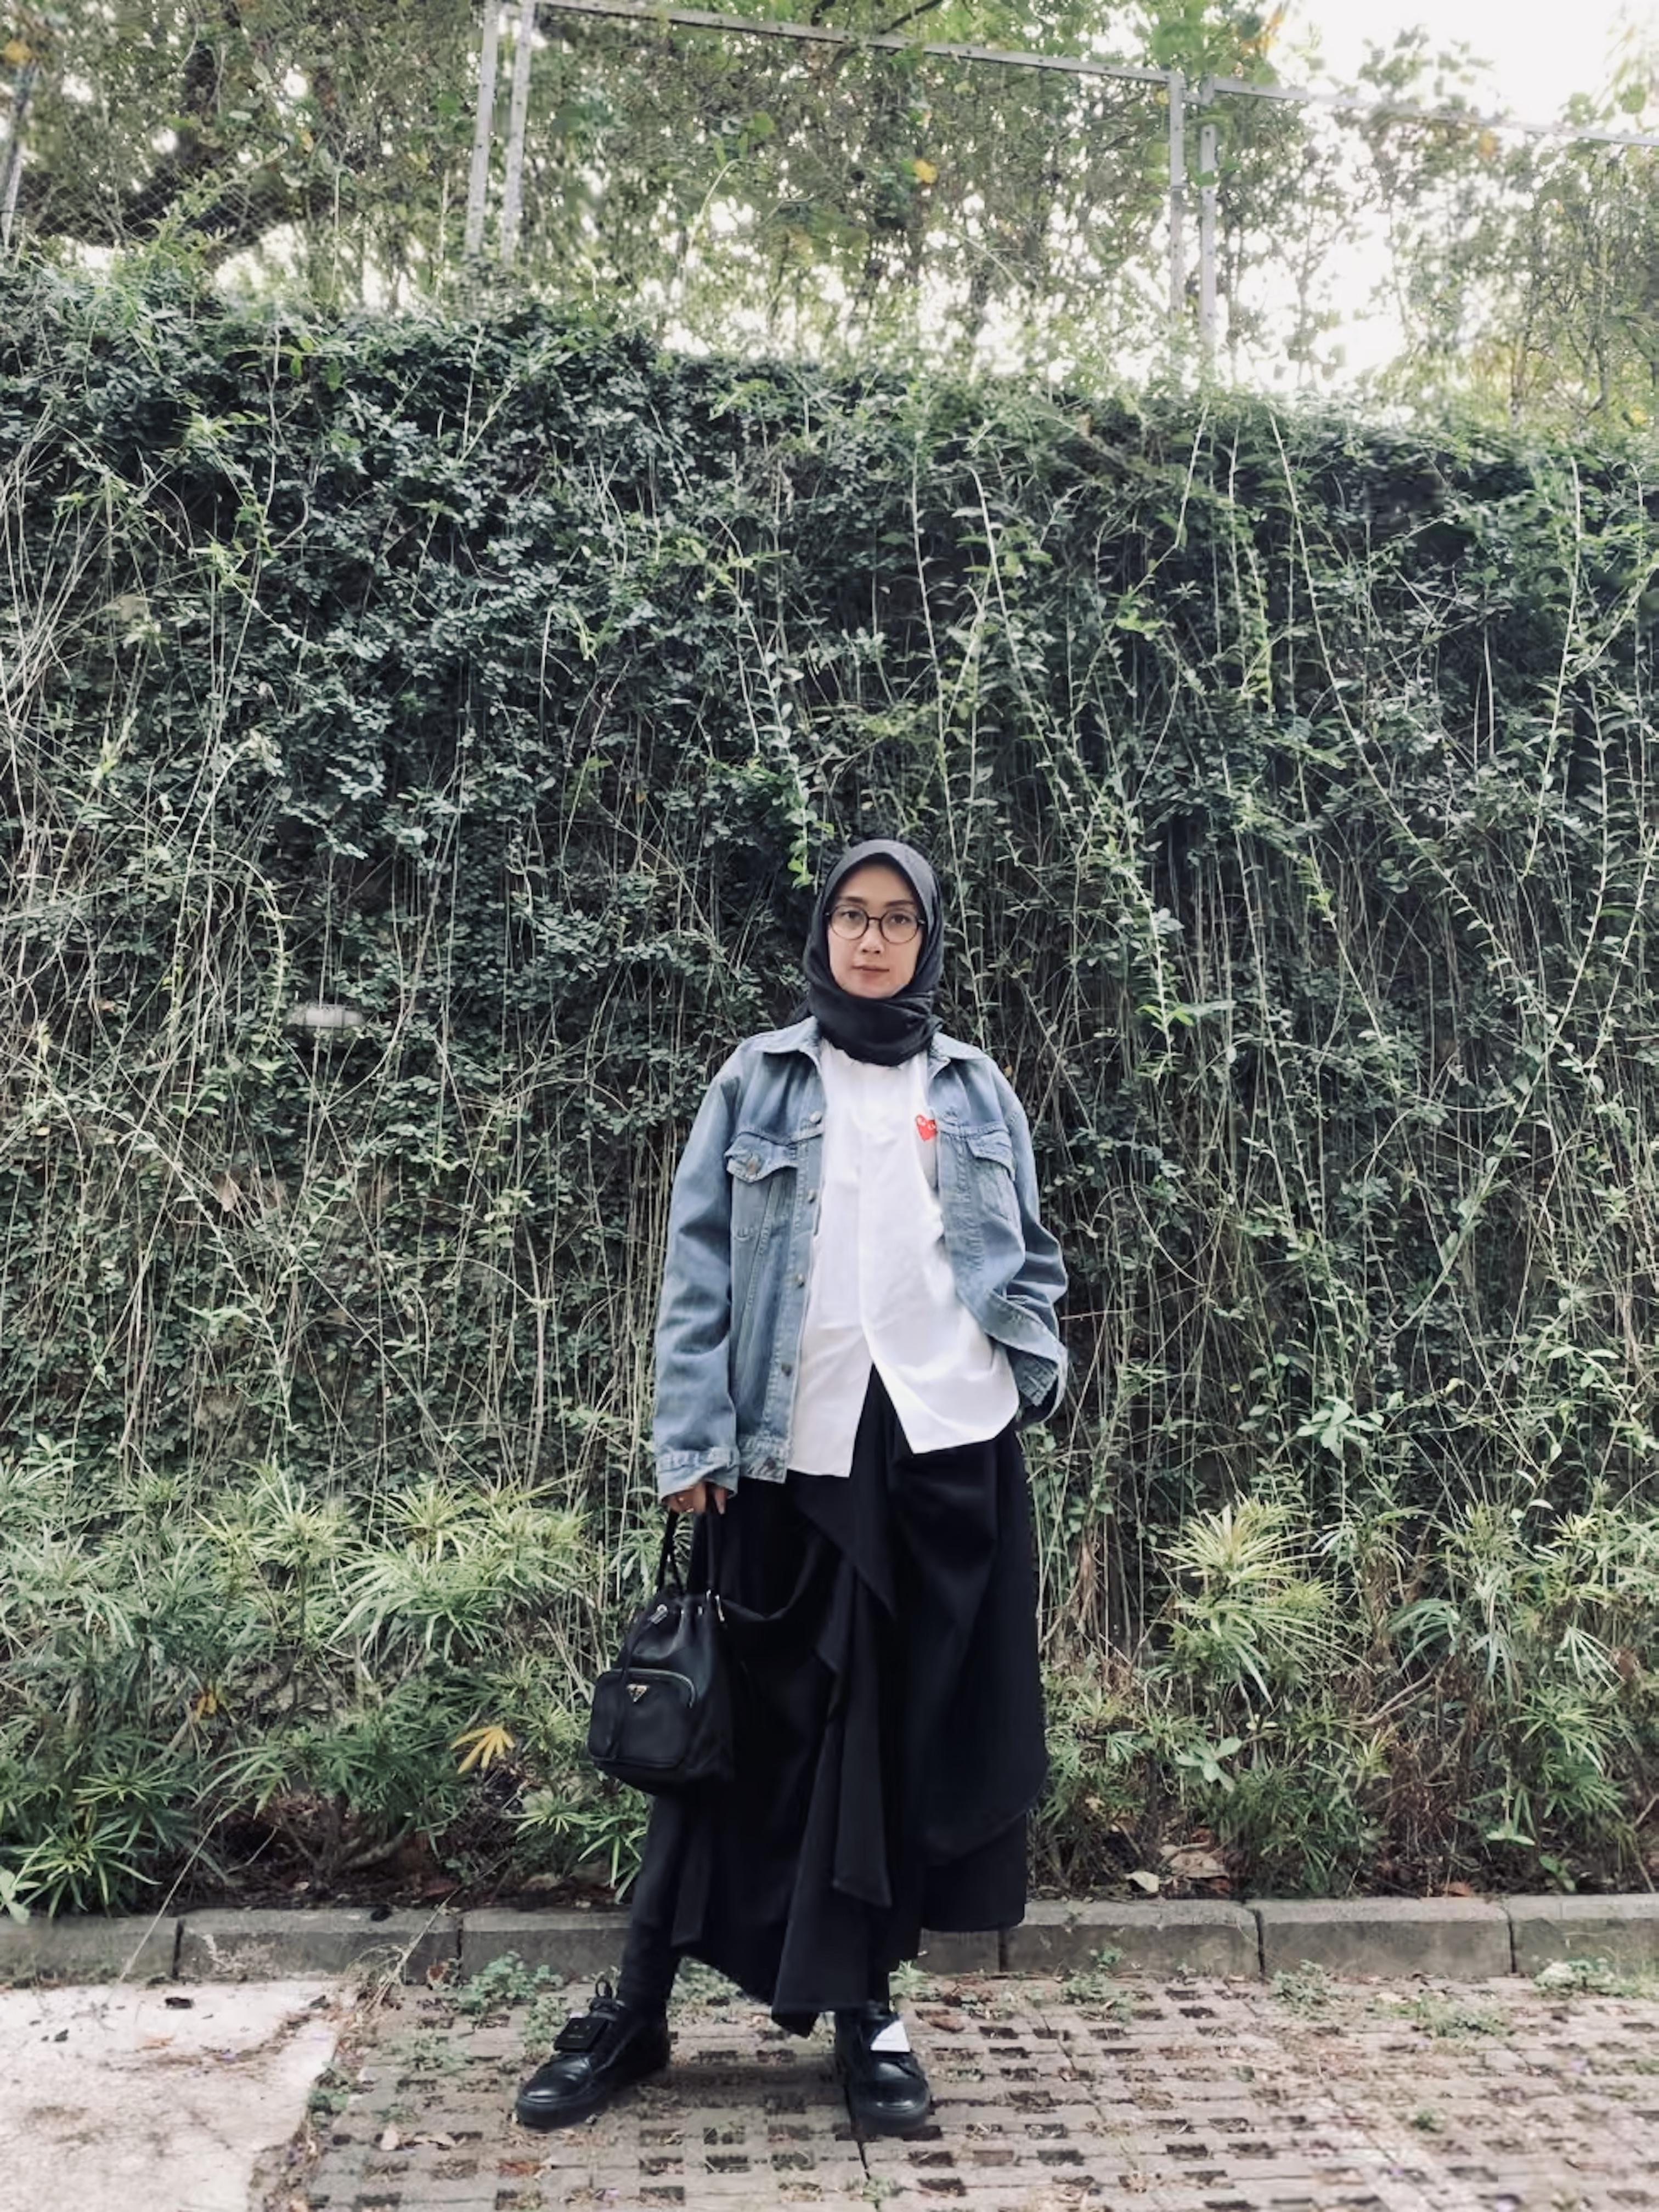 Our Creative Director Renni Andriani in #rashawllook image